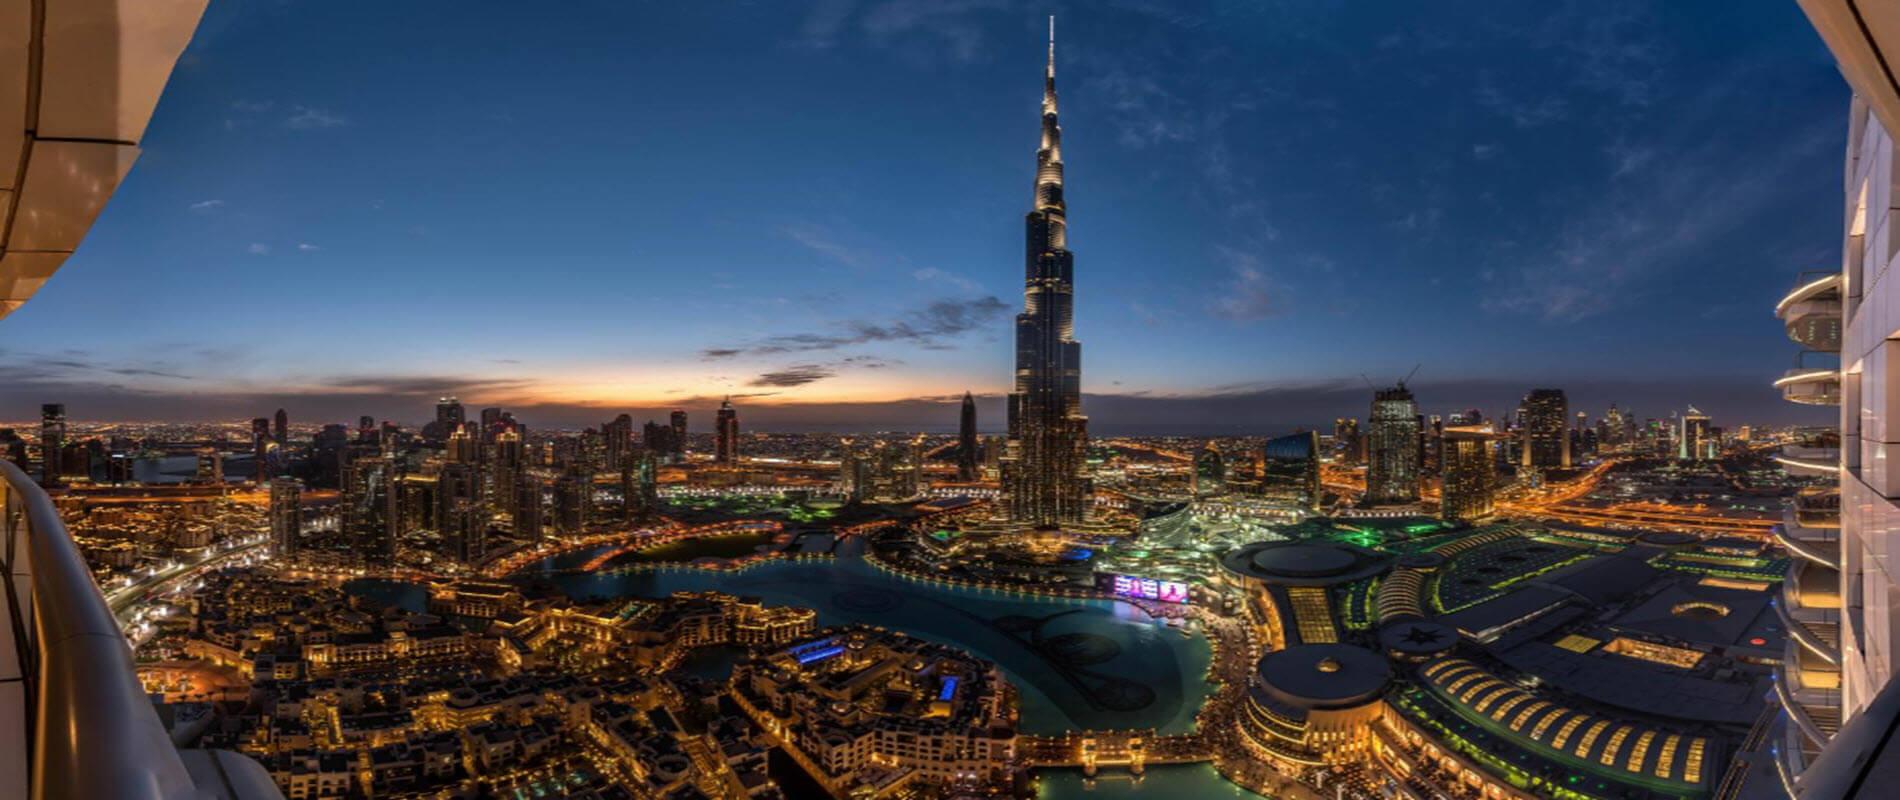 Burj Khalifa 124 Floor Boardwalk Combo Tickets